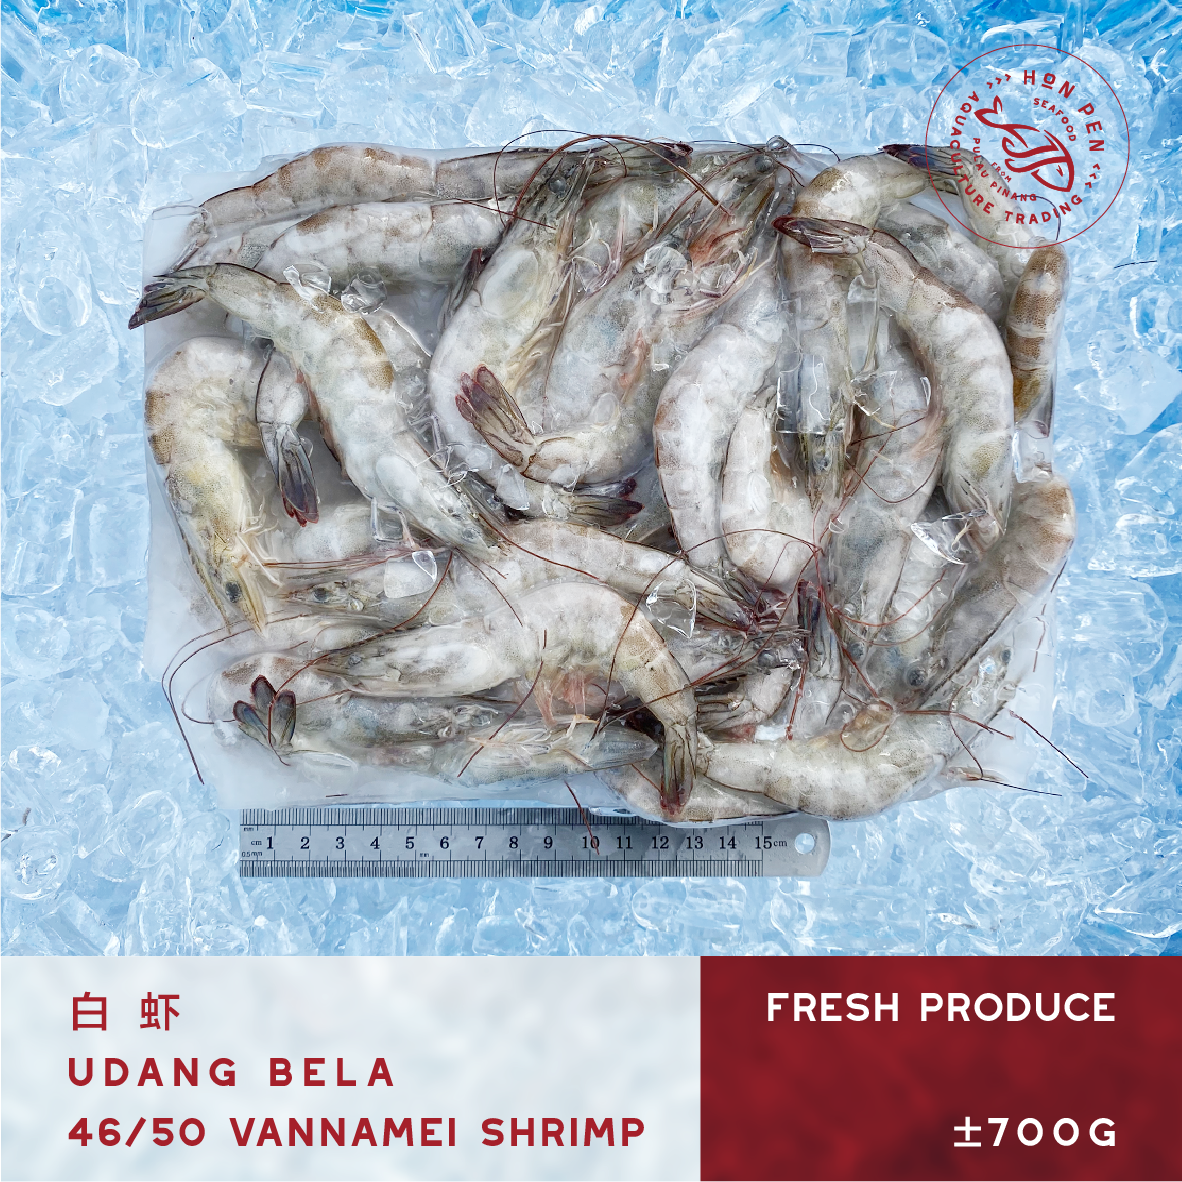 VANNAMEI SHRIMP 46/50 白虾 UDANG BELA (Seafood) ±700g